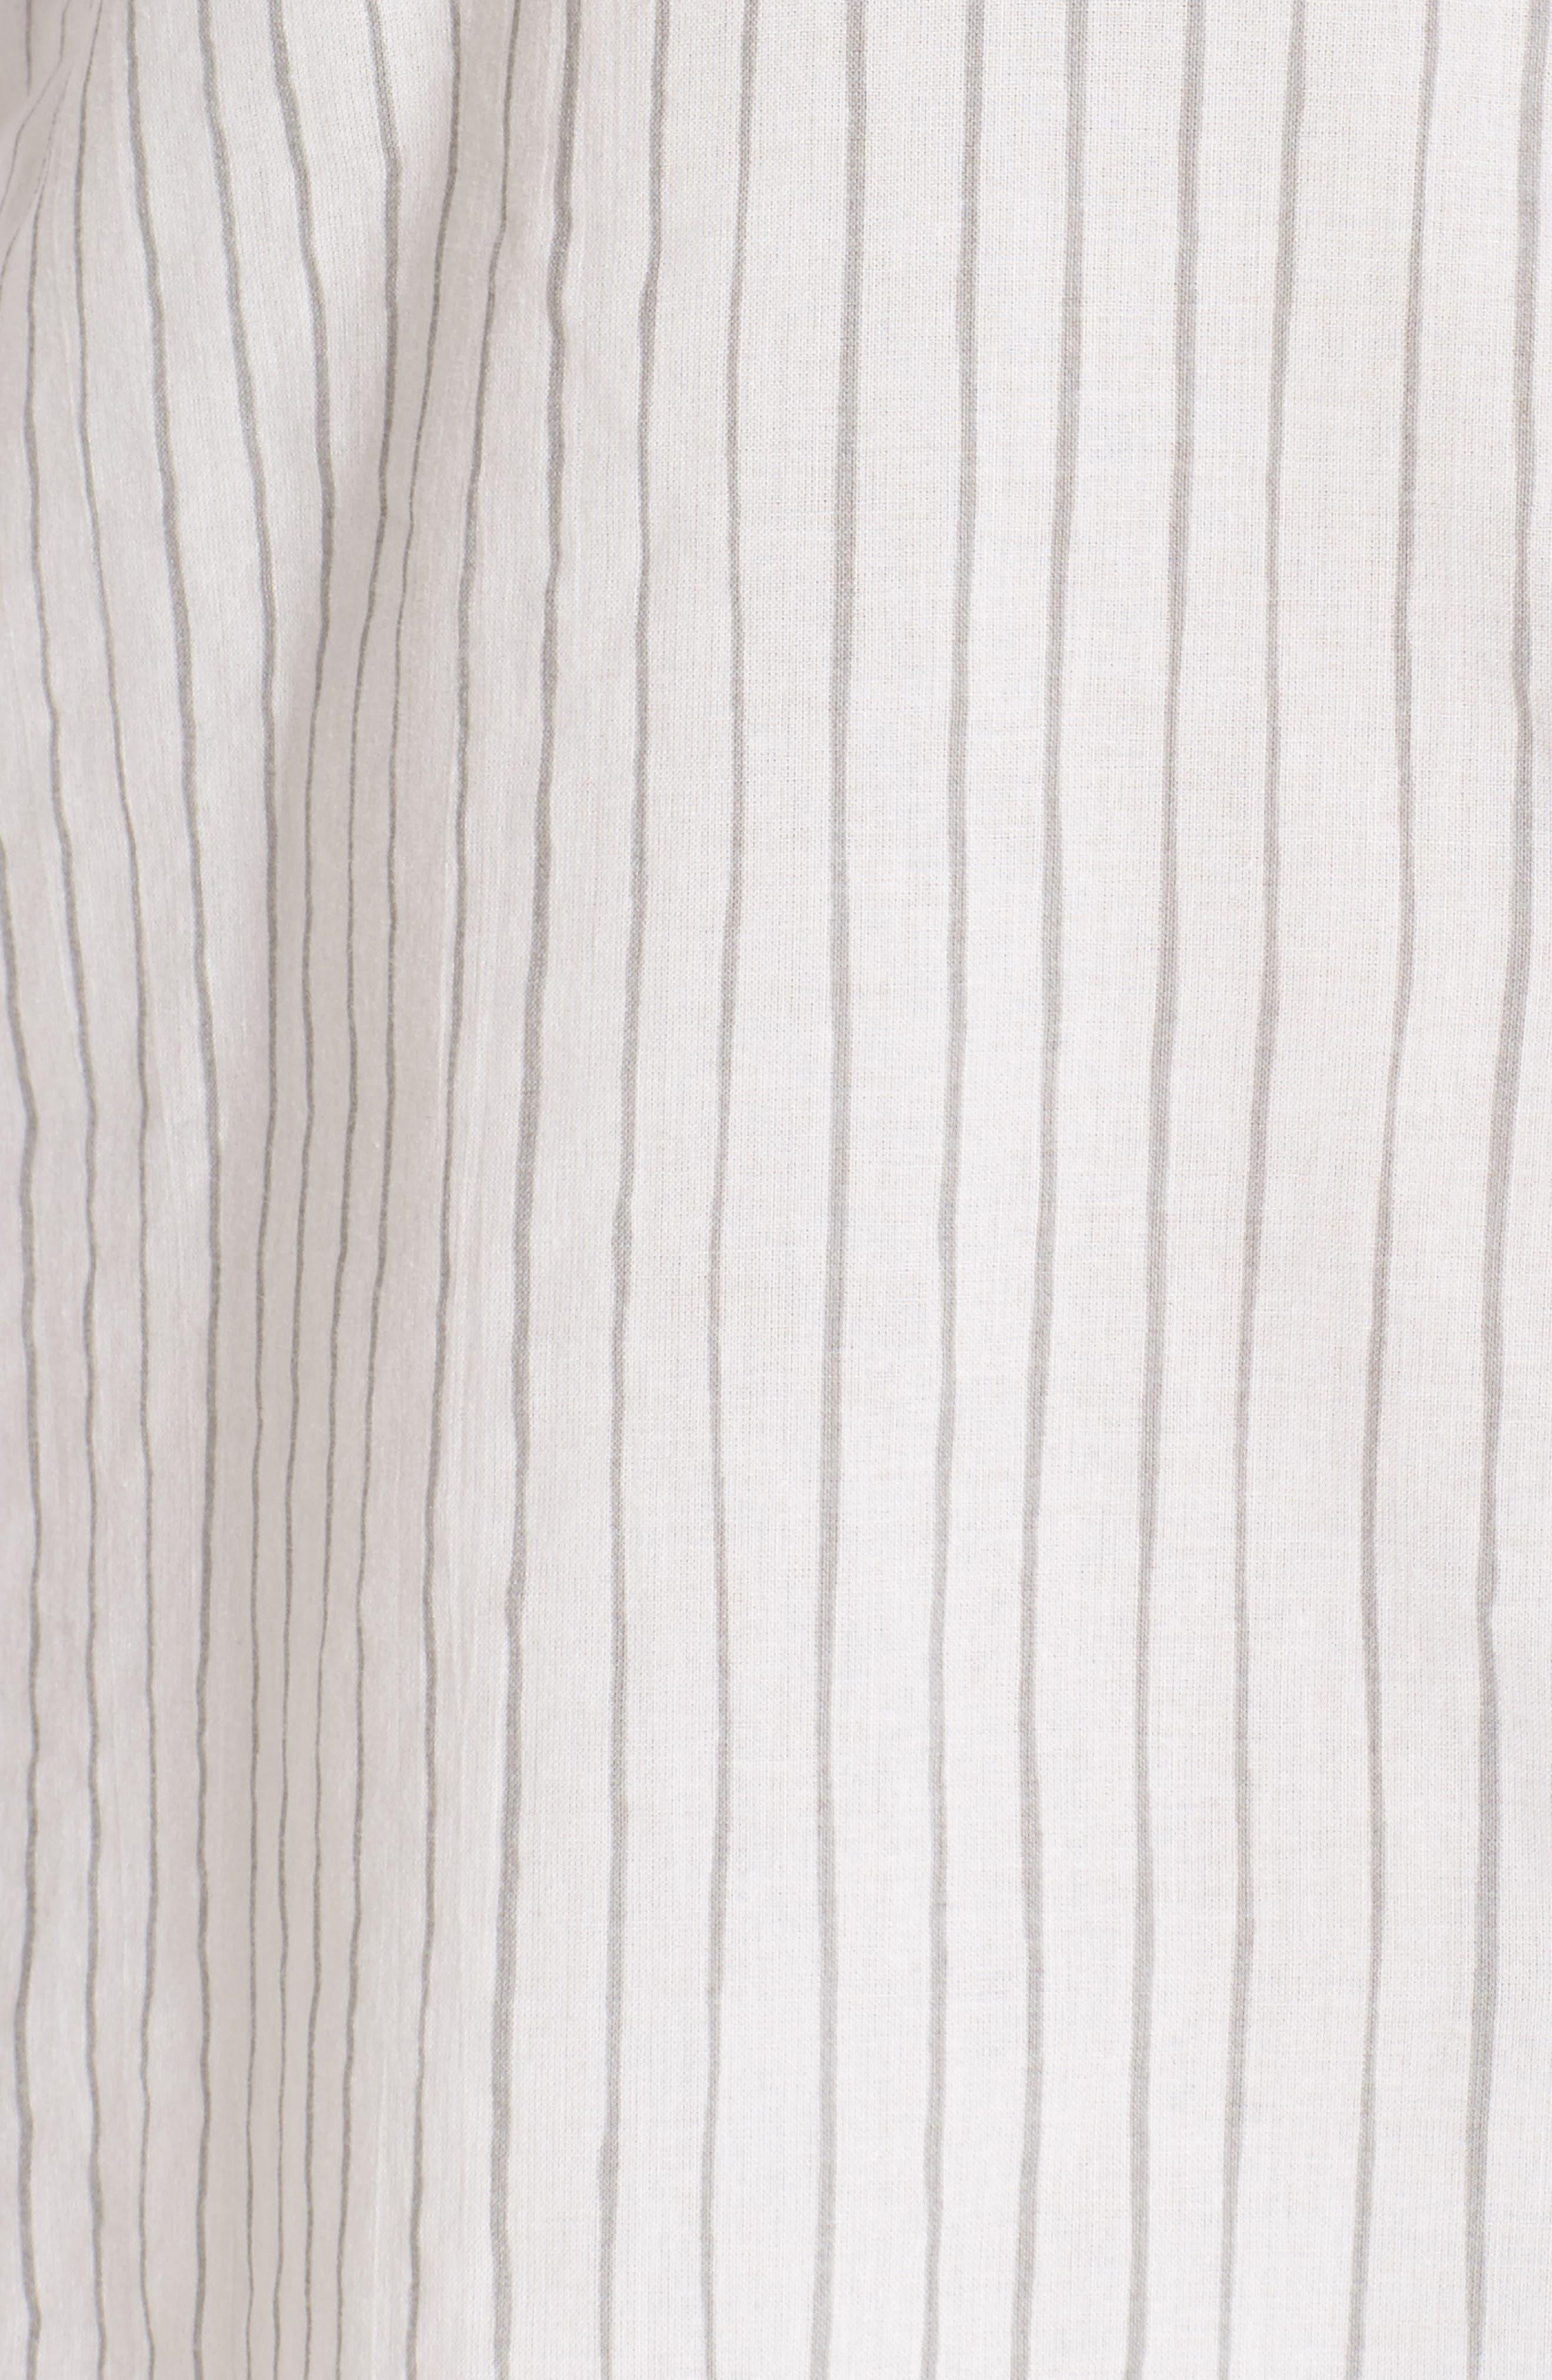 Pinstripe Boyfriend Sleep Shirt,                             Alternate thumbnail 5, color,                             020